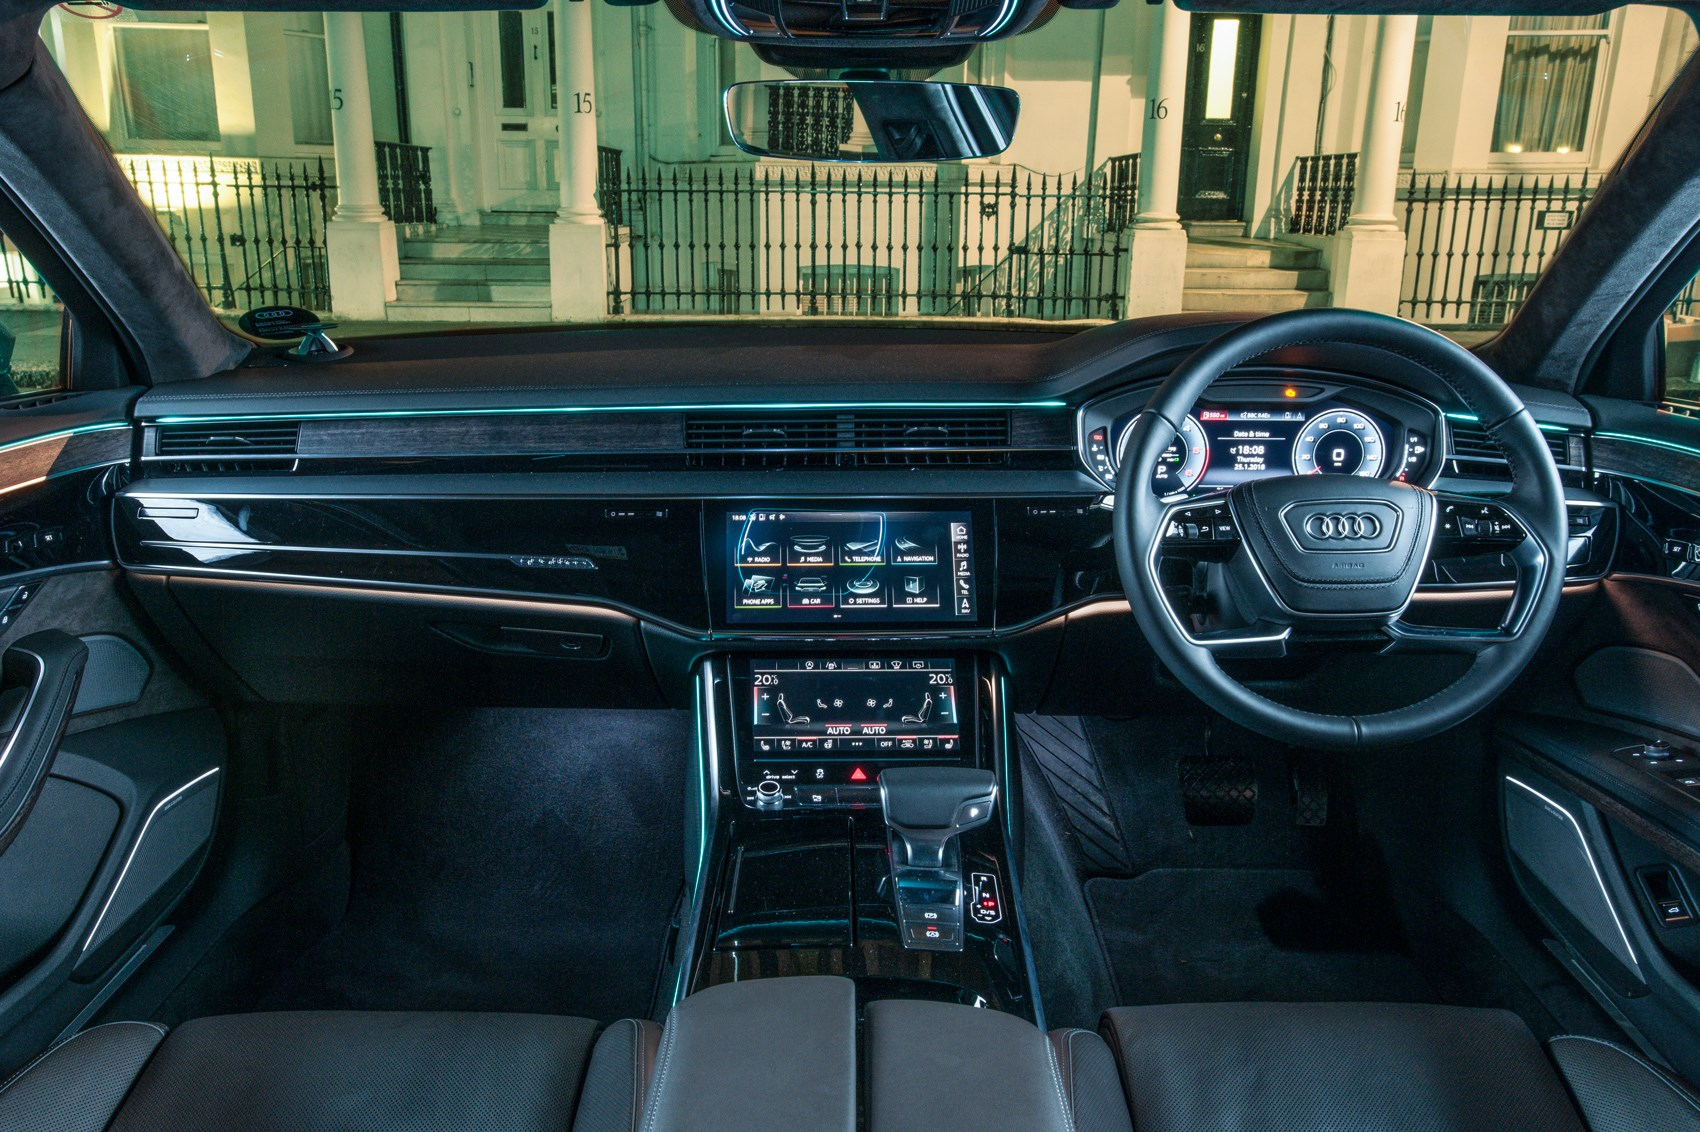 mercedes s class vs audi a8 vs bmw 7 series 2018 triple test review car magazine. Black Bedroom Furniture Sets. Home Design Ideas